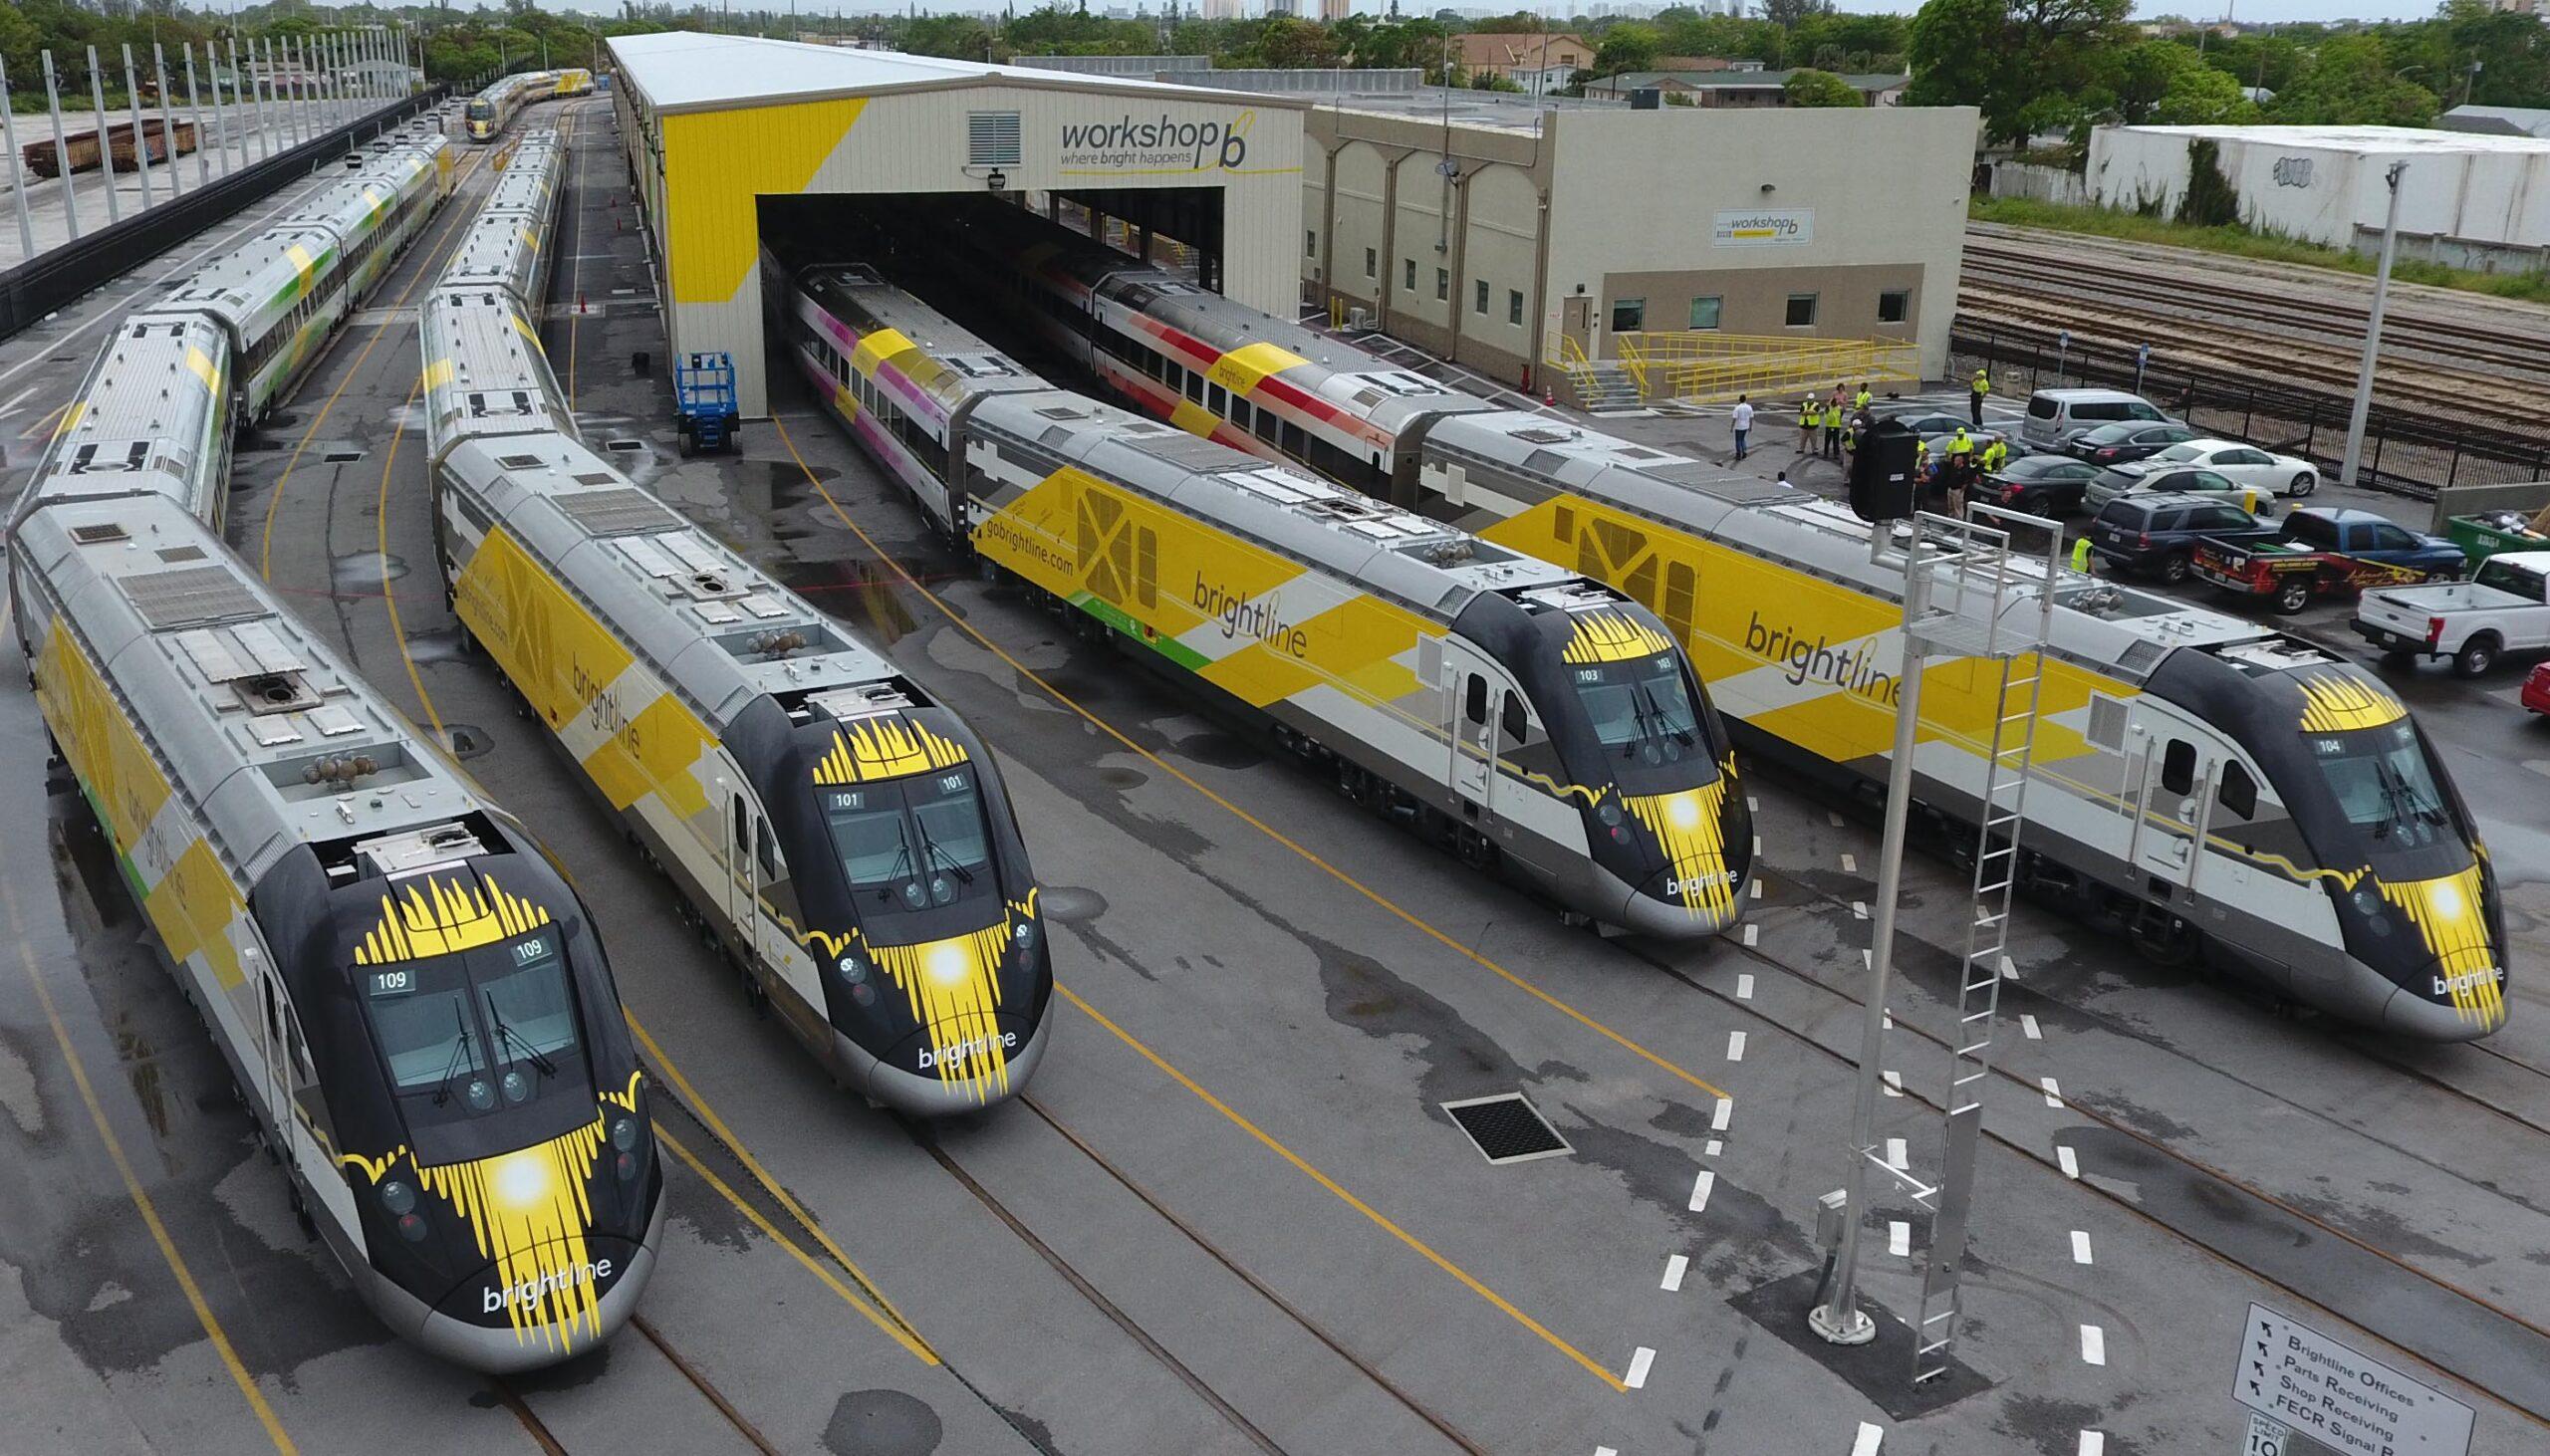 Brightline (Virgin Trains USA) trains in Florida